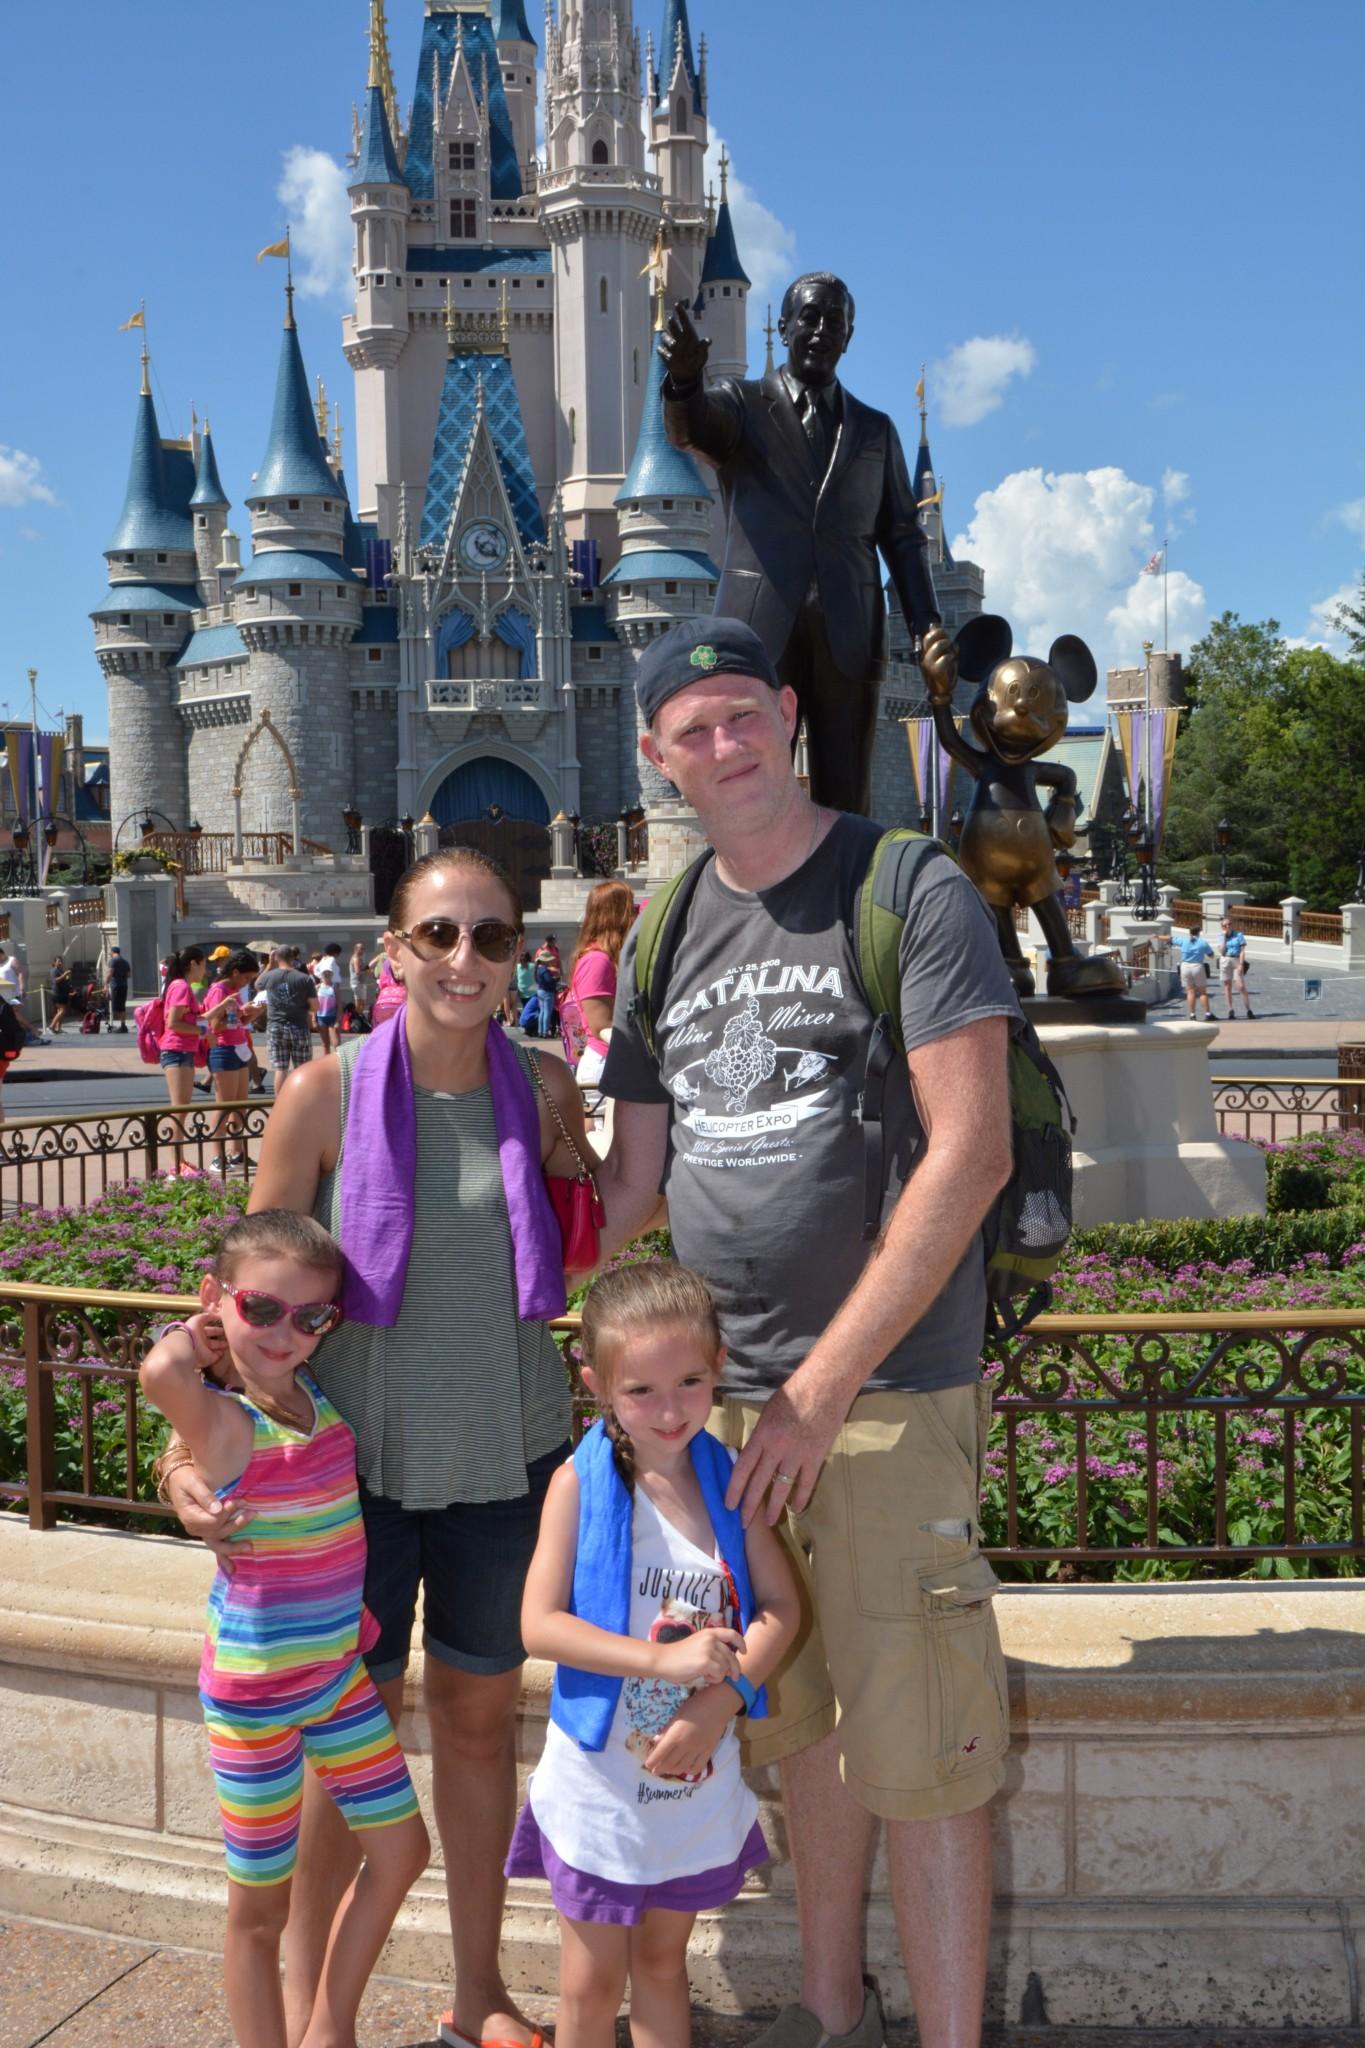 Disney World Posing in front of Cinderella's Castle